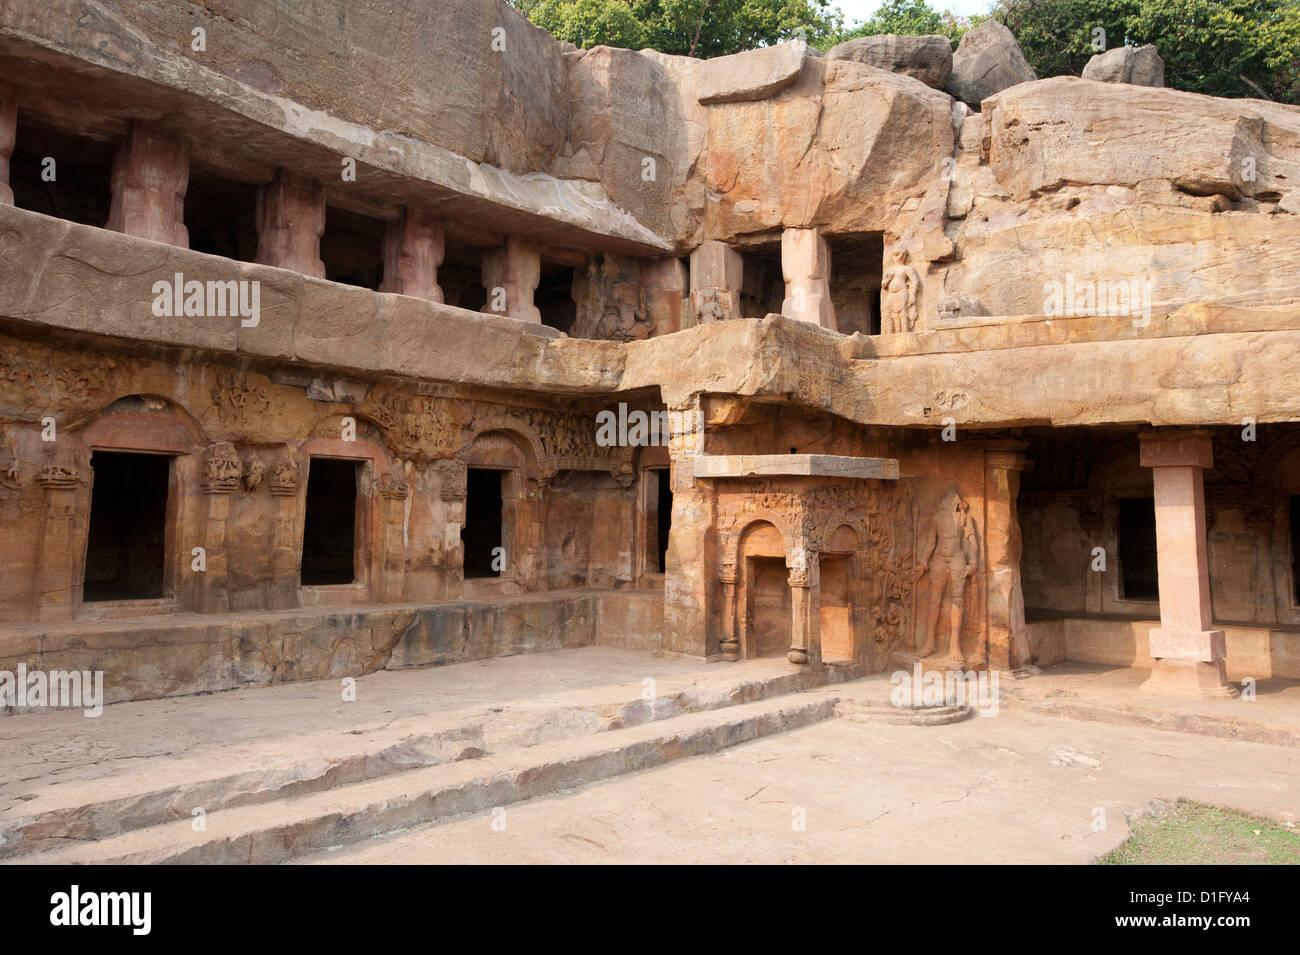 Ranigumpha, cave number 1 of Udayagiri caves, once used as meeting place for Jain monks, Bhubaneshwar, Orissa, India - Stock Image